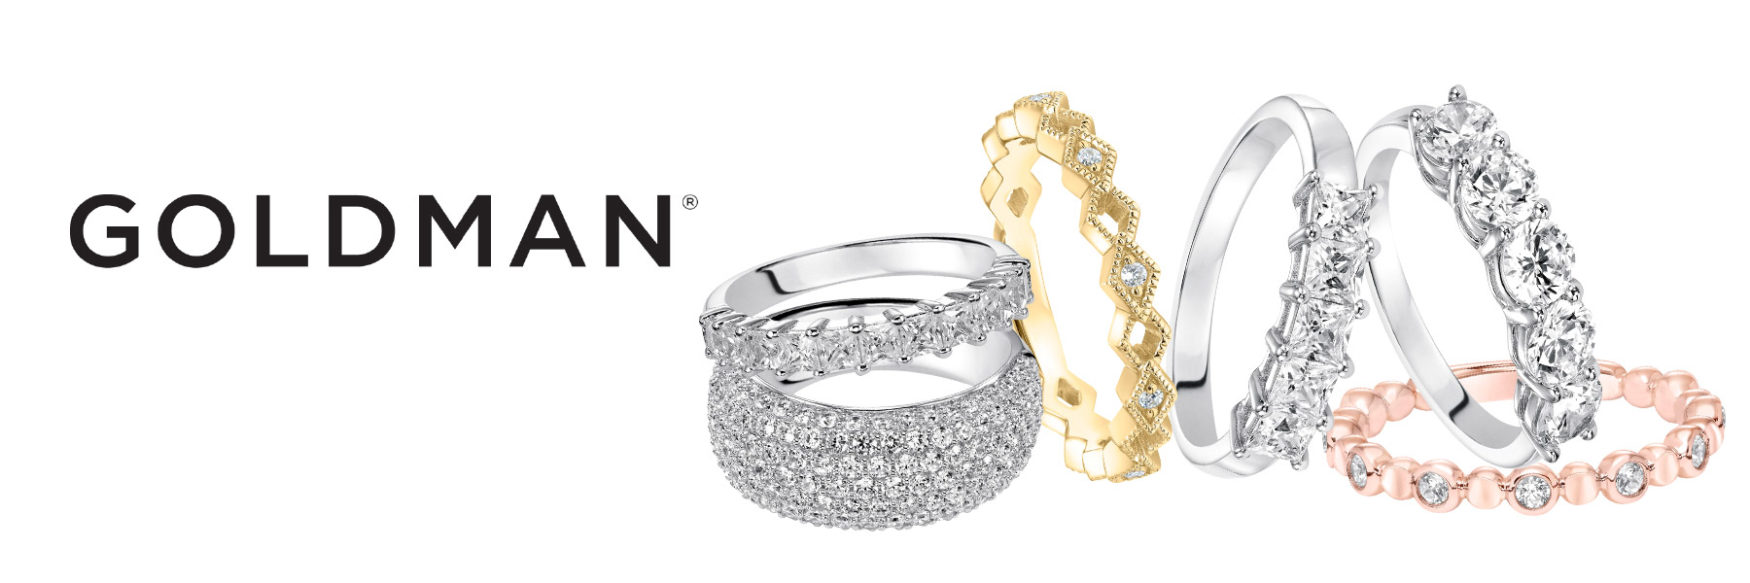 long island wedding rings - goldman - womens